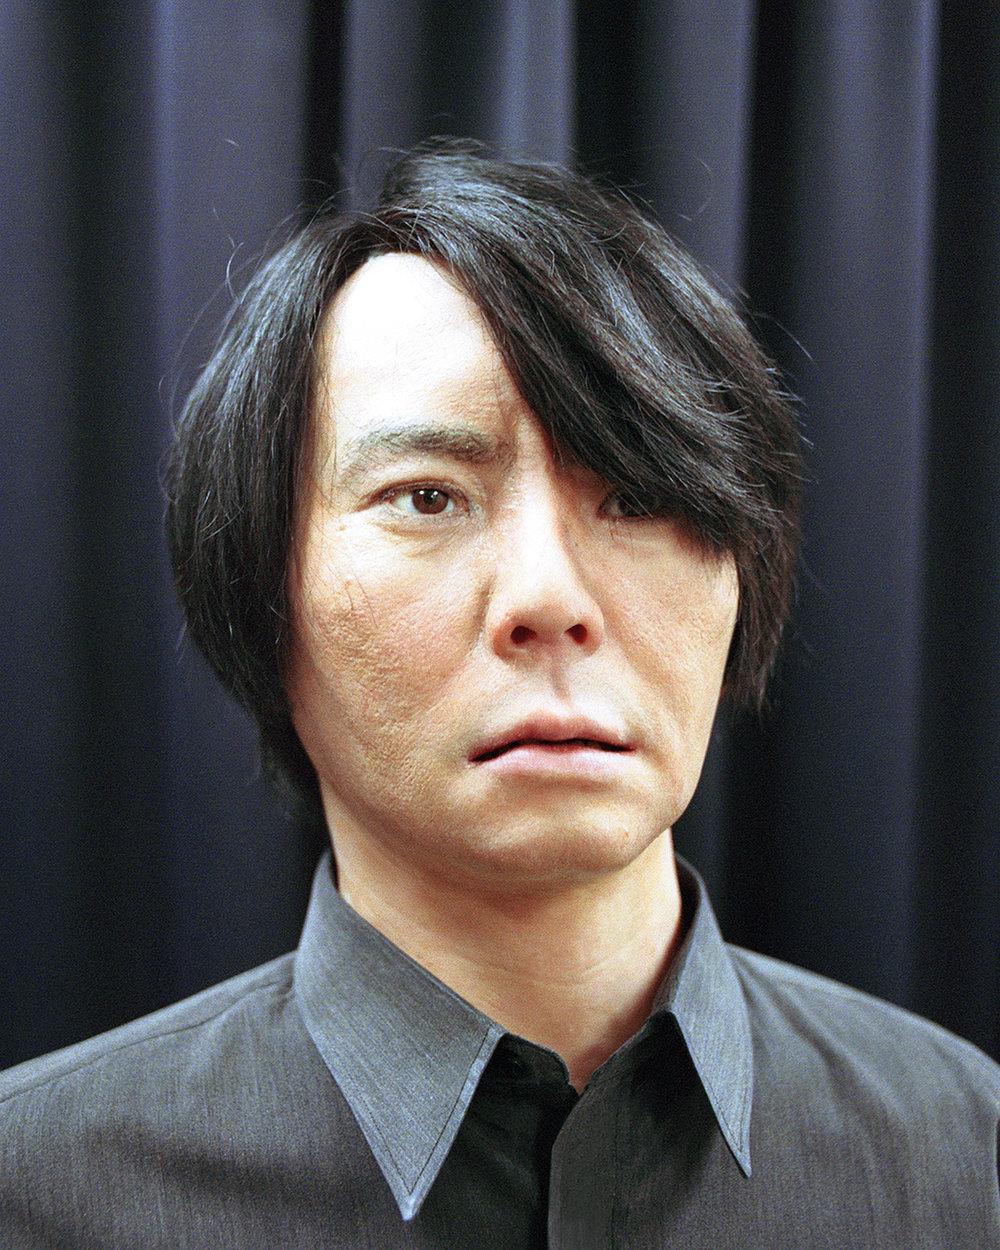 Portrait of Geminoid HI-2,  2013  Hiroshi Ishiguro Laboratories, ATR